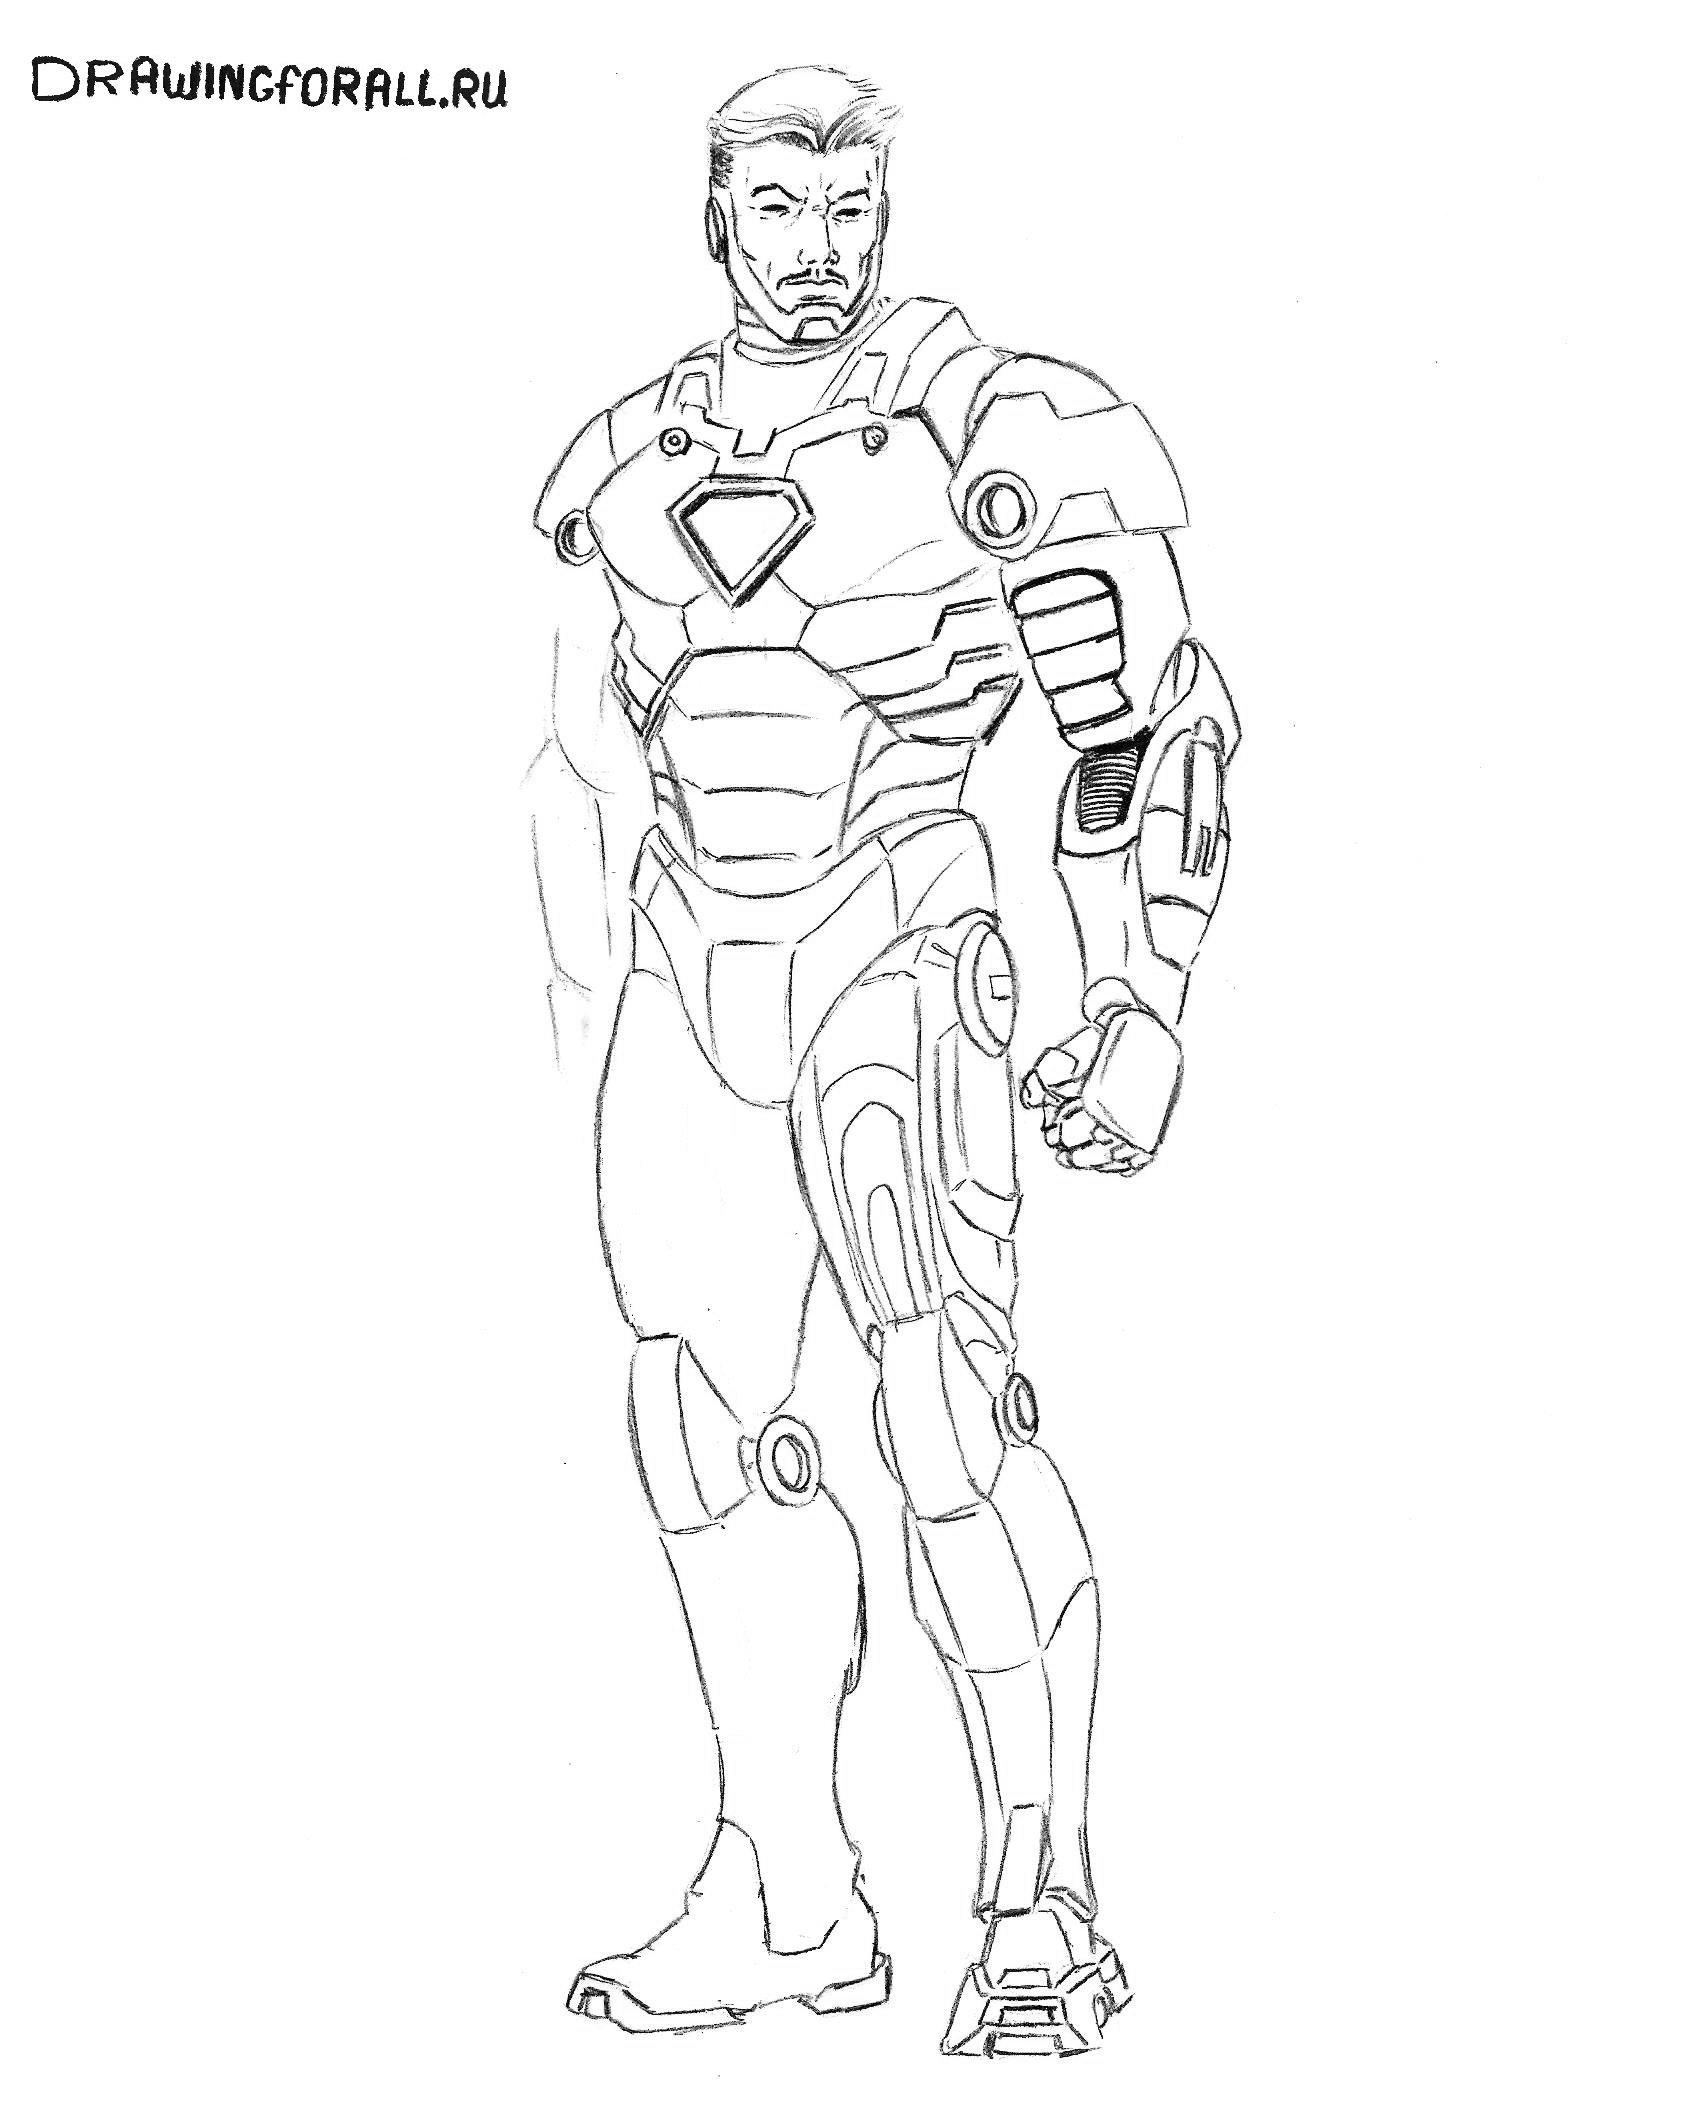 картинки железного человека нарисованные